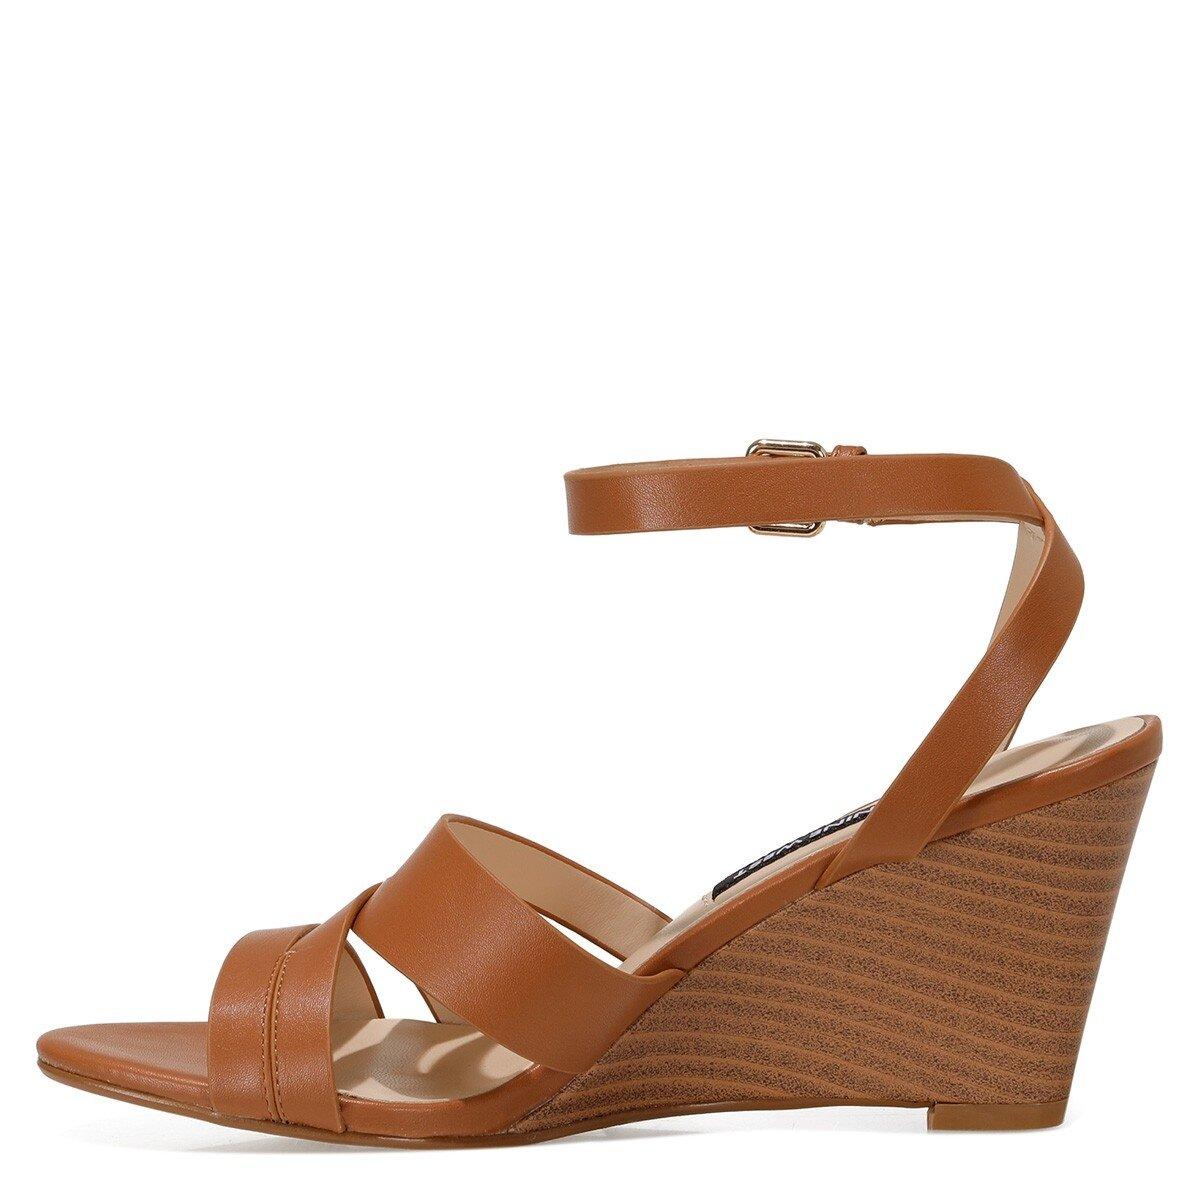 HAILI 1FX Taba Kadın Dolgu Topuklu Sandalet